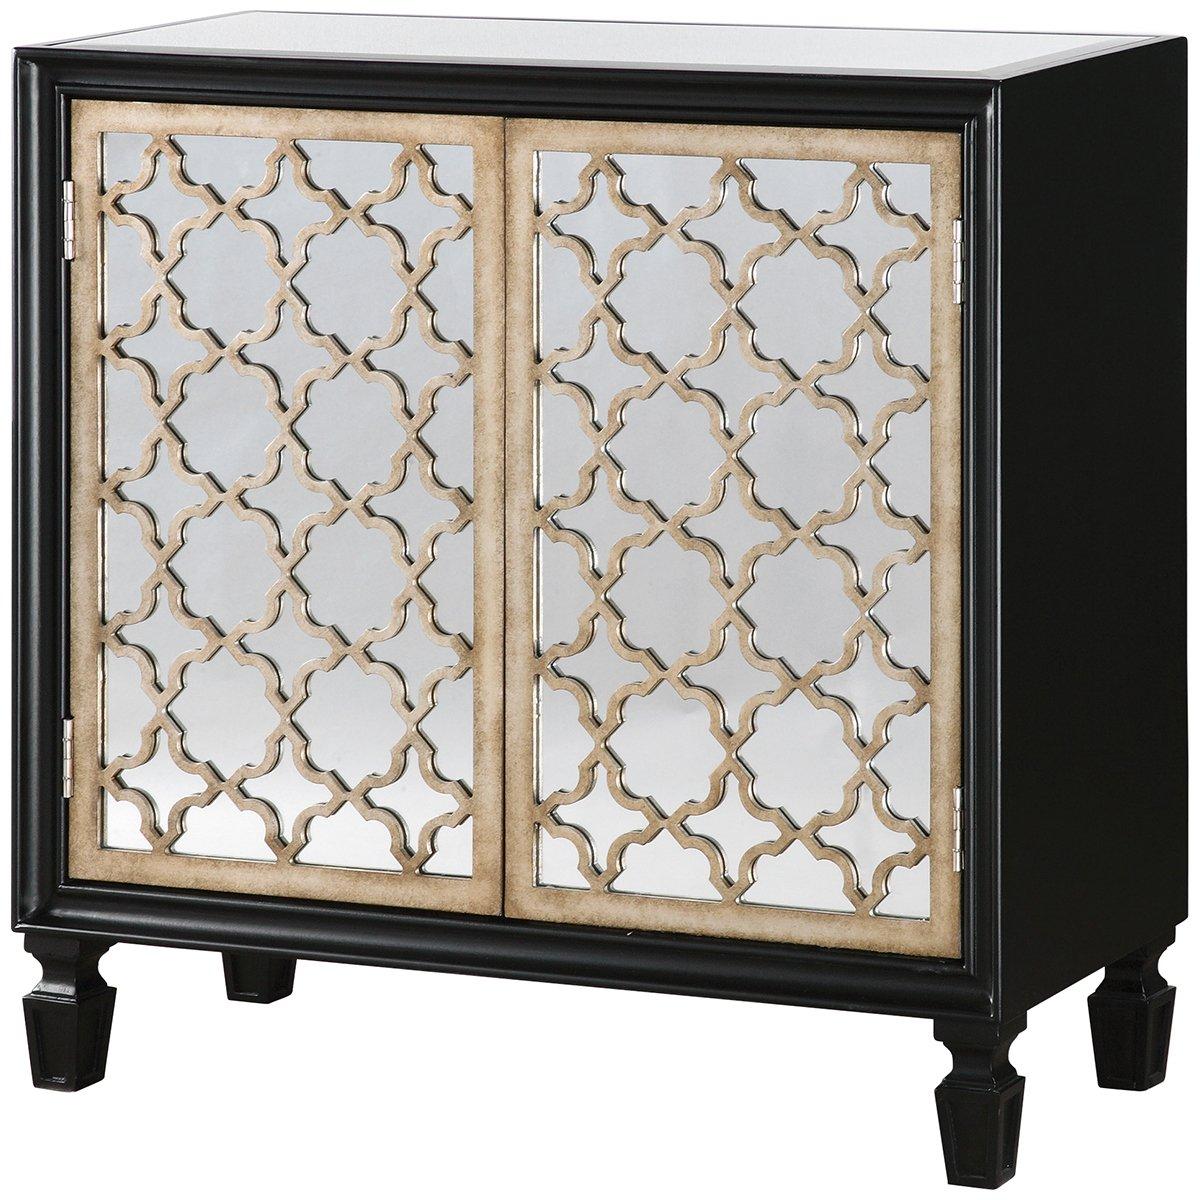 Good Amazon.com: Uttermost 24498 Franzea Mirrored Console Cabinet: Kitchen U0026  Dining